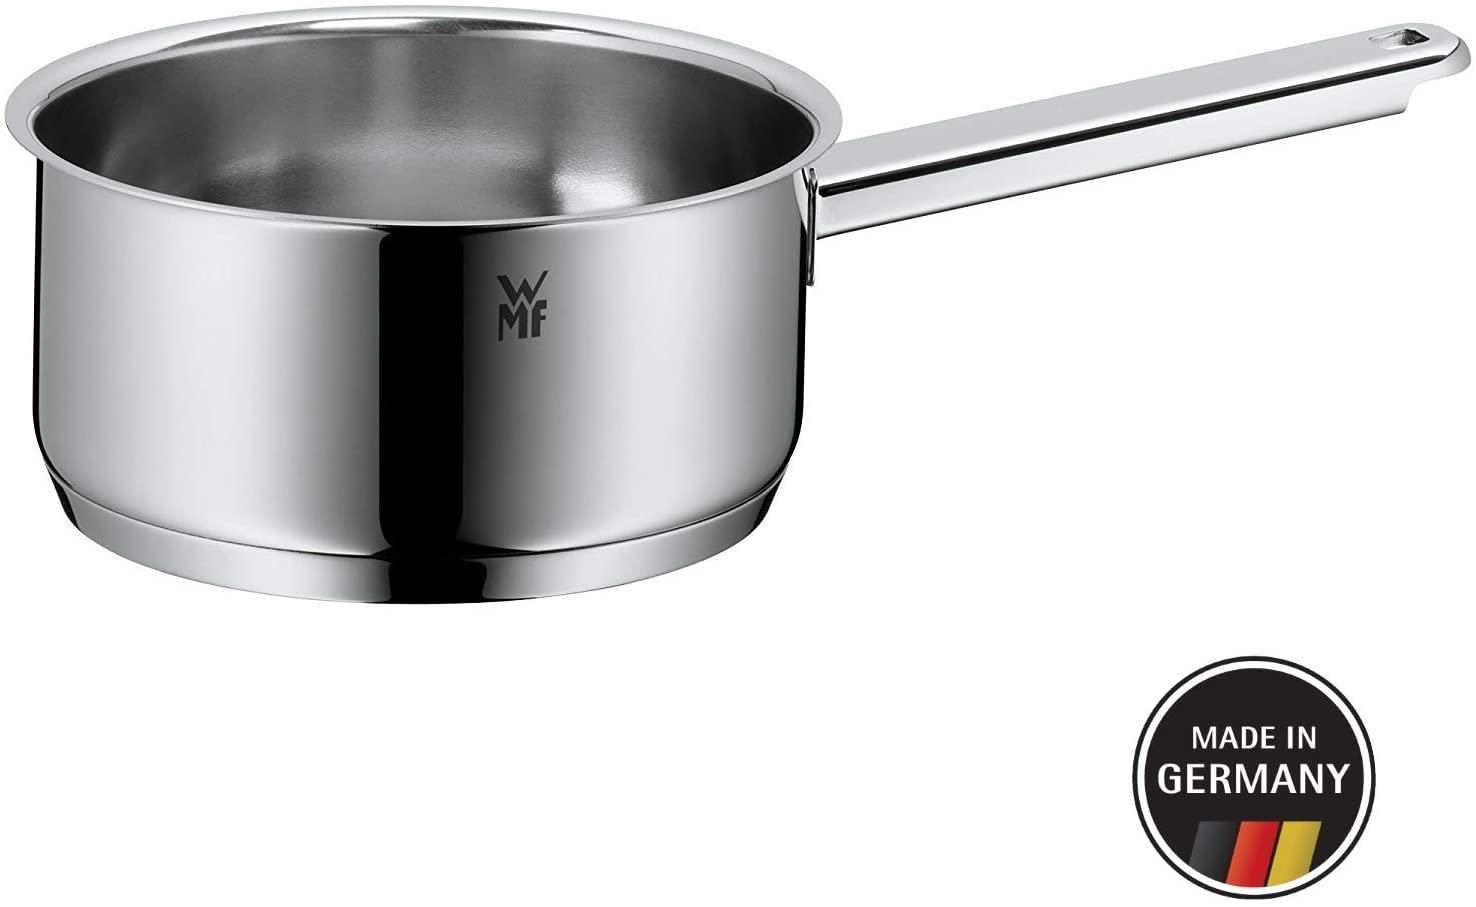 Rendlík 16 cm Premium One - WMF